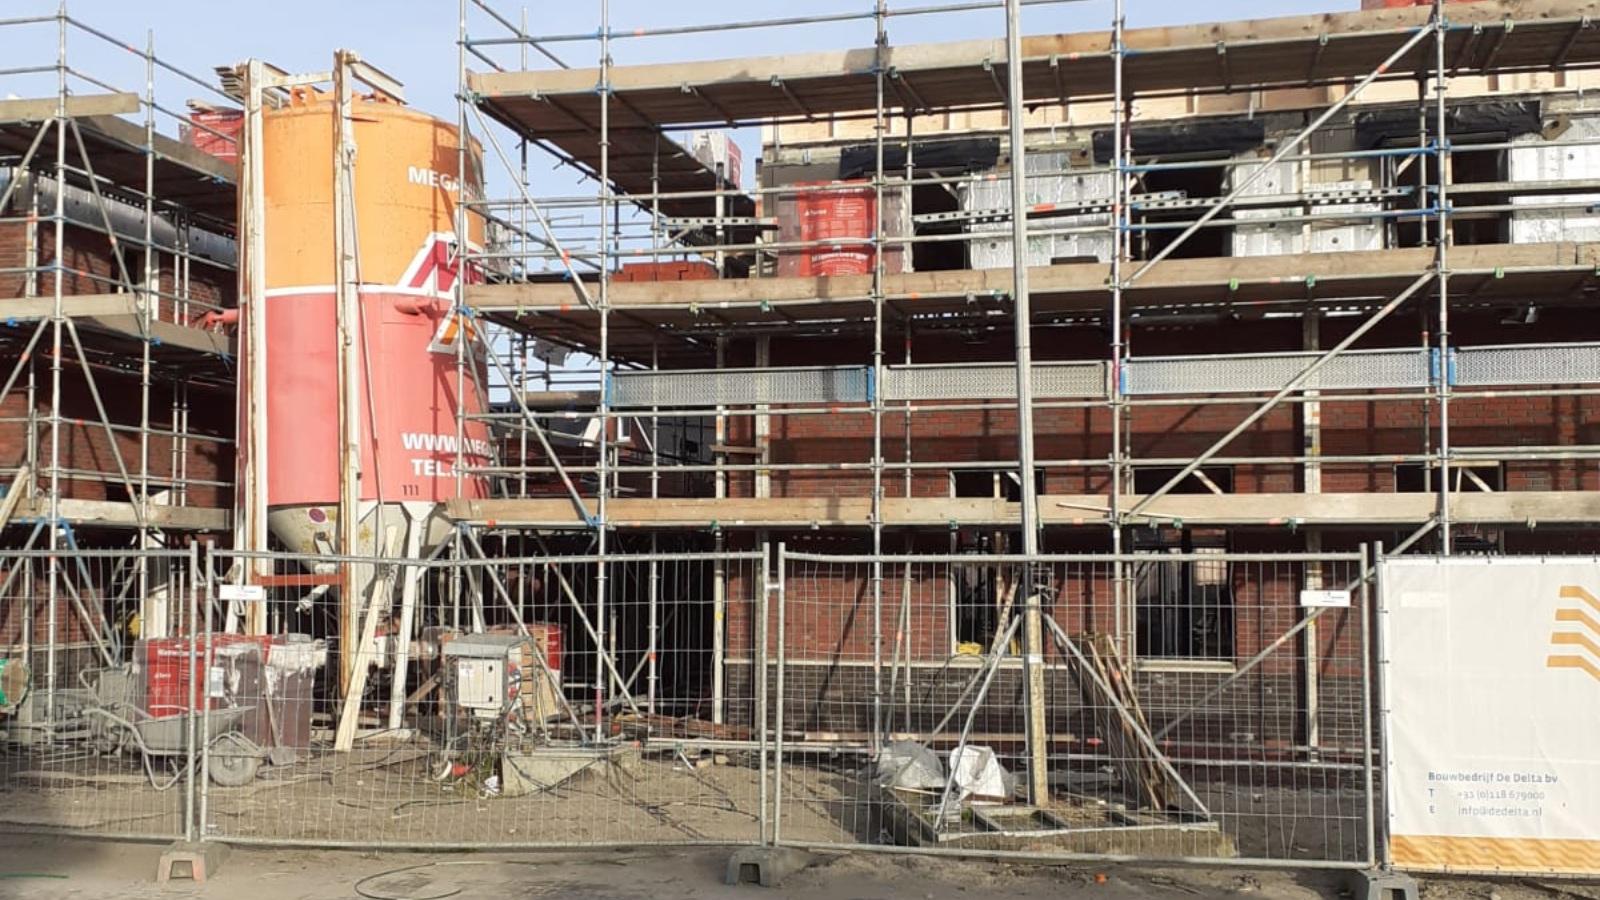 Nieuwbouw Rittenburg Middelburg